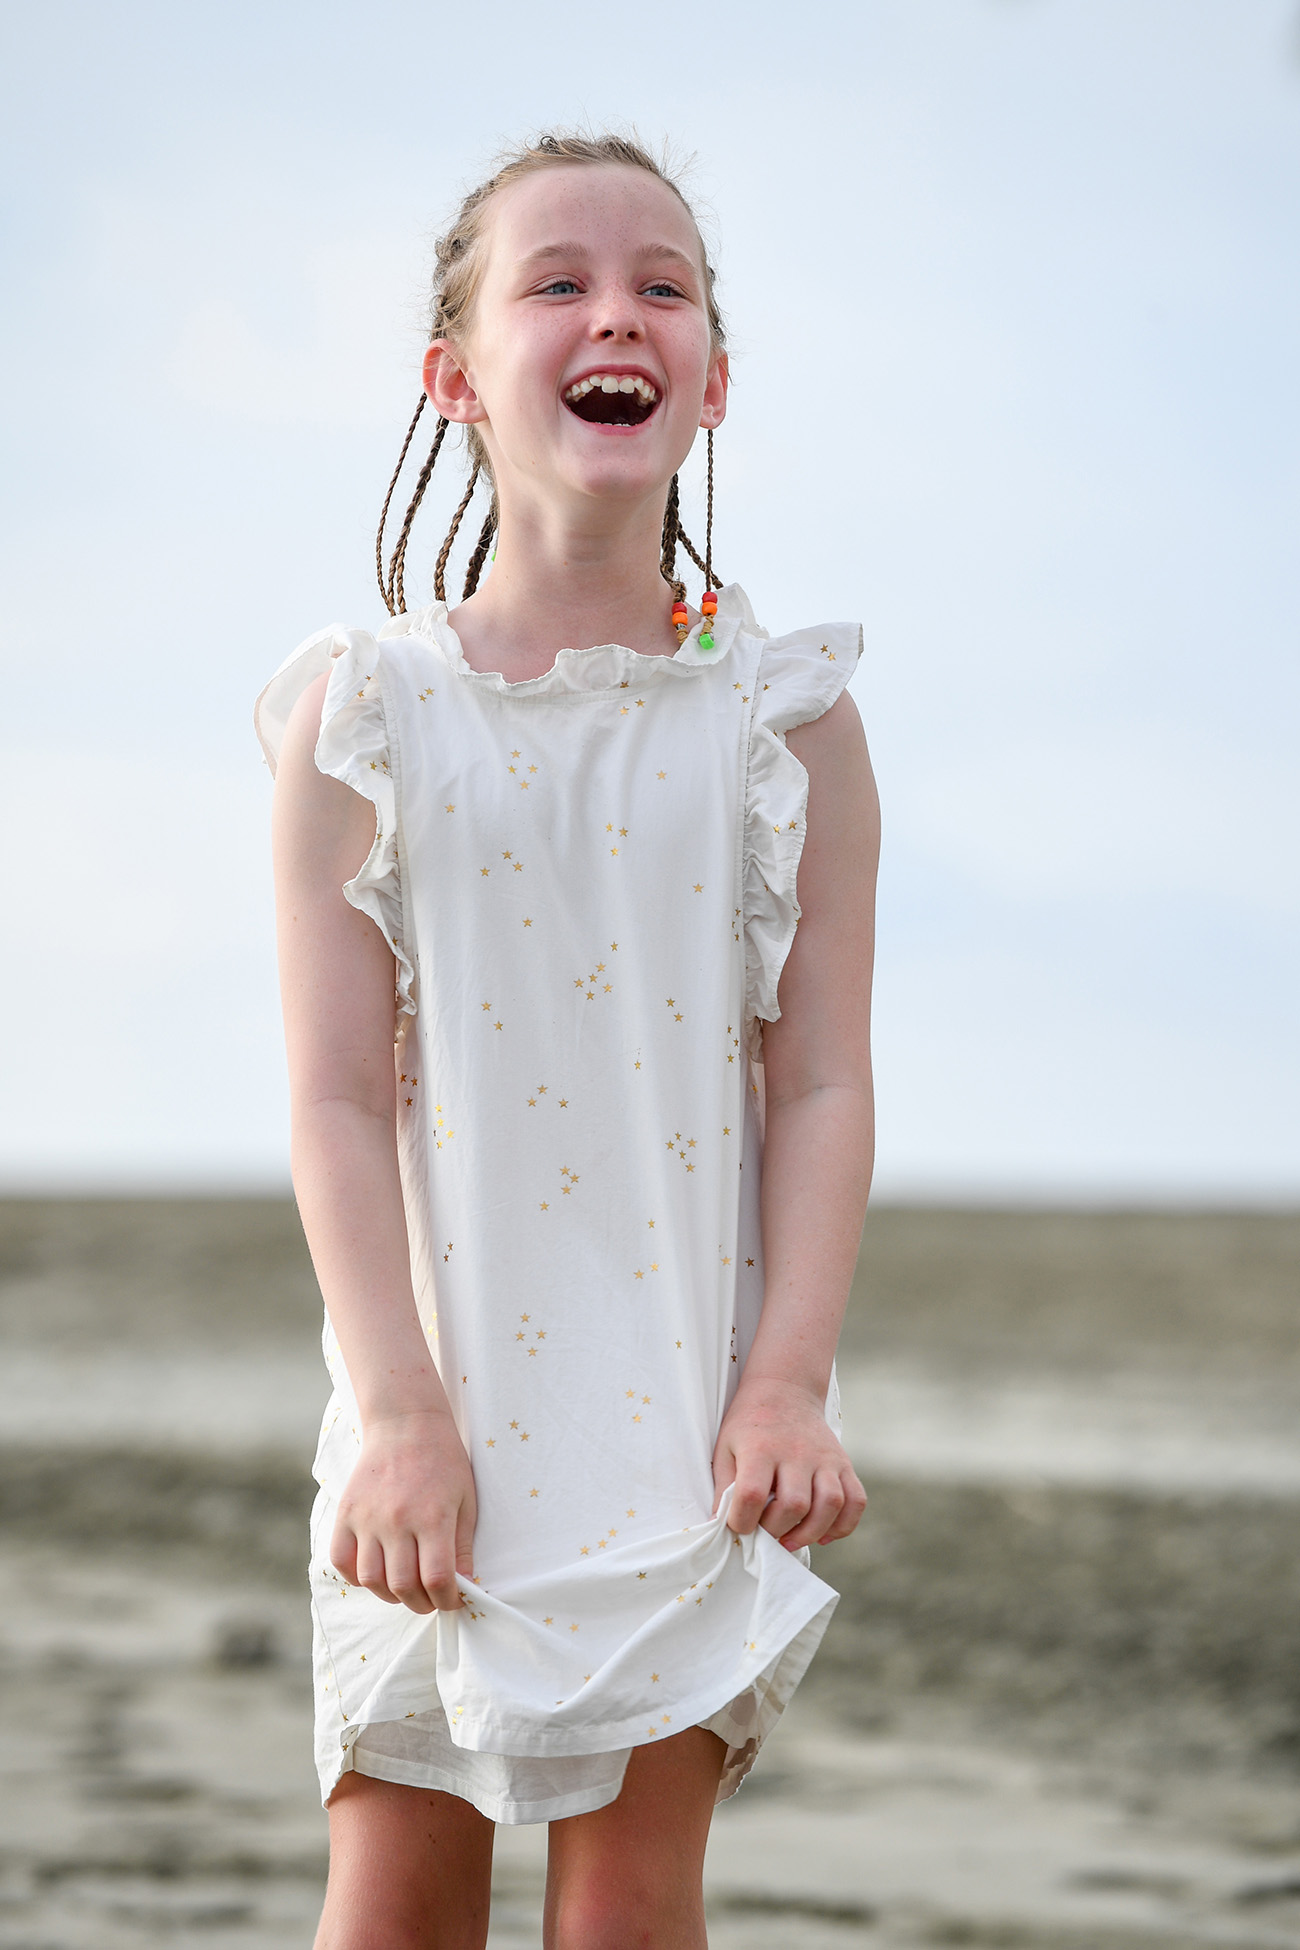 Cute caucasian girl in braids laughs on the beach